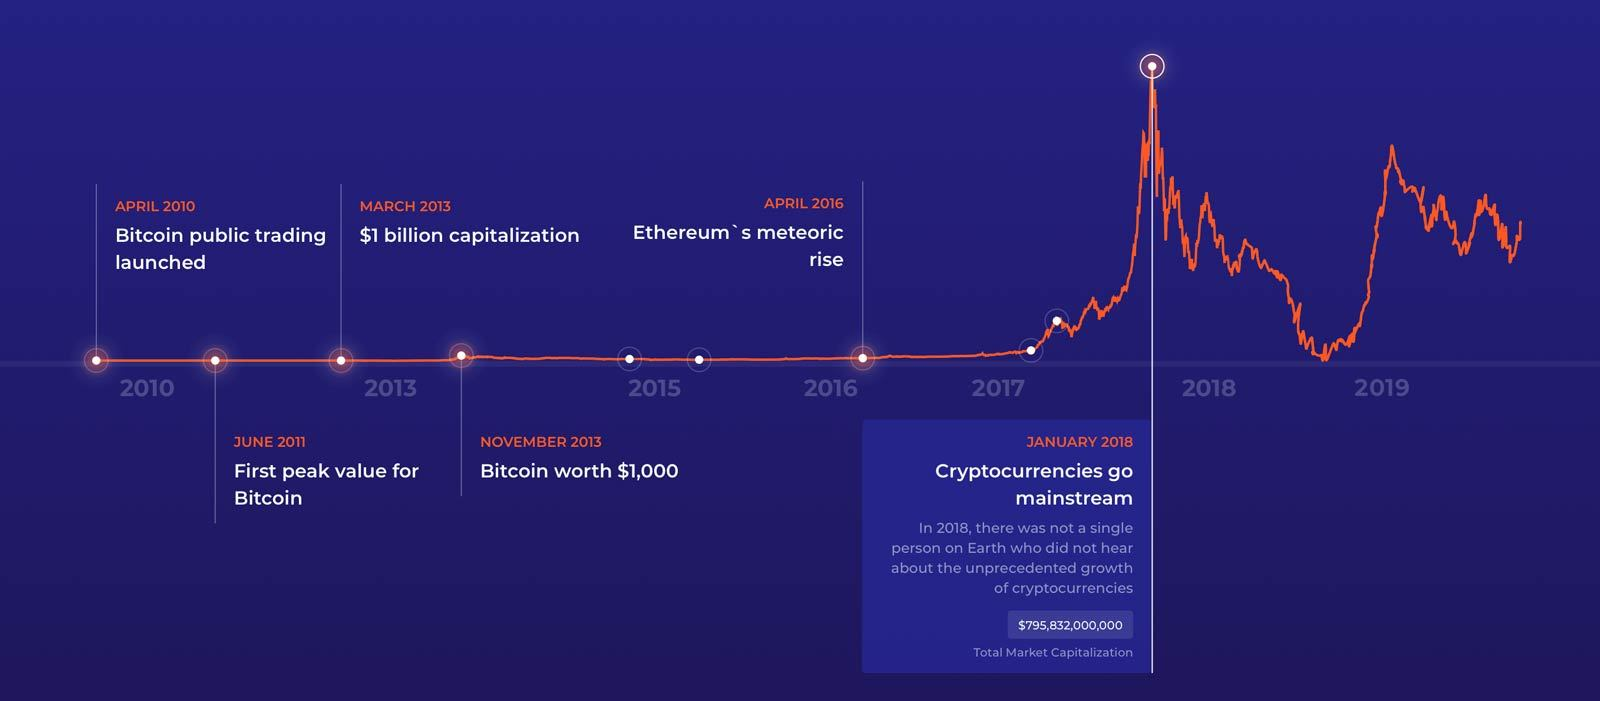 professzionális crypto trading platform bitcoin barrie